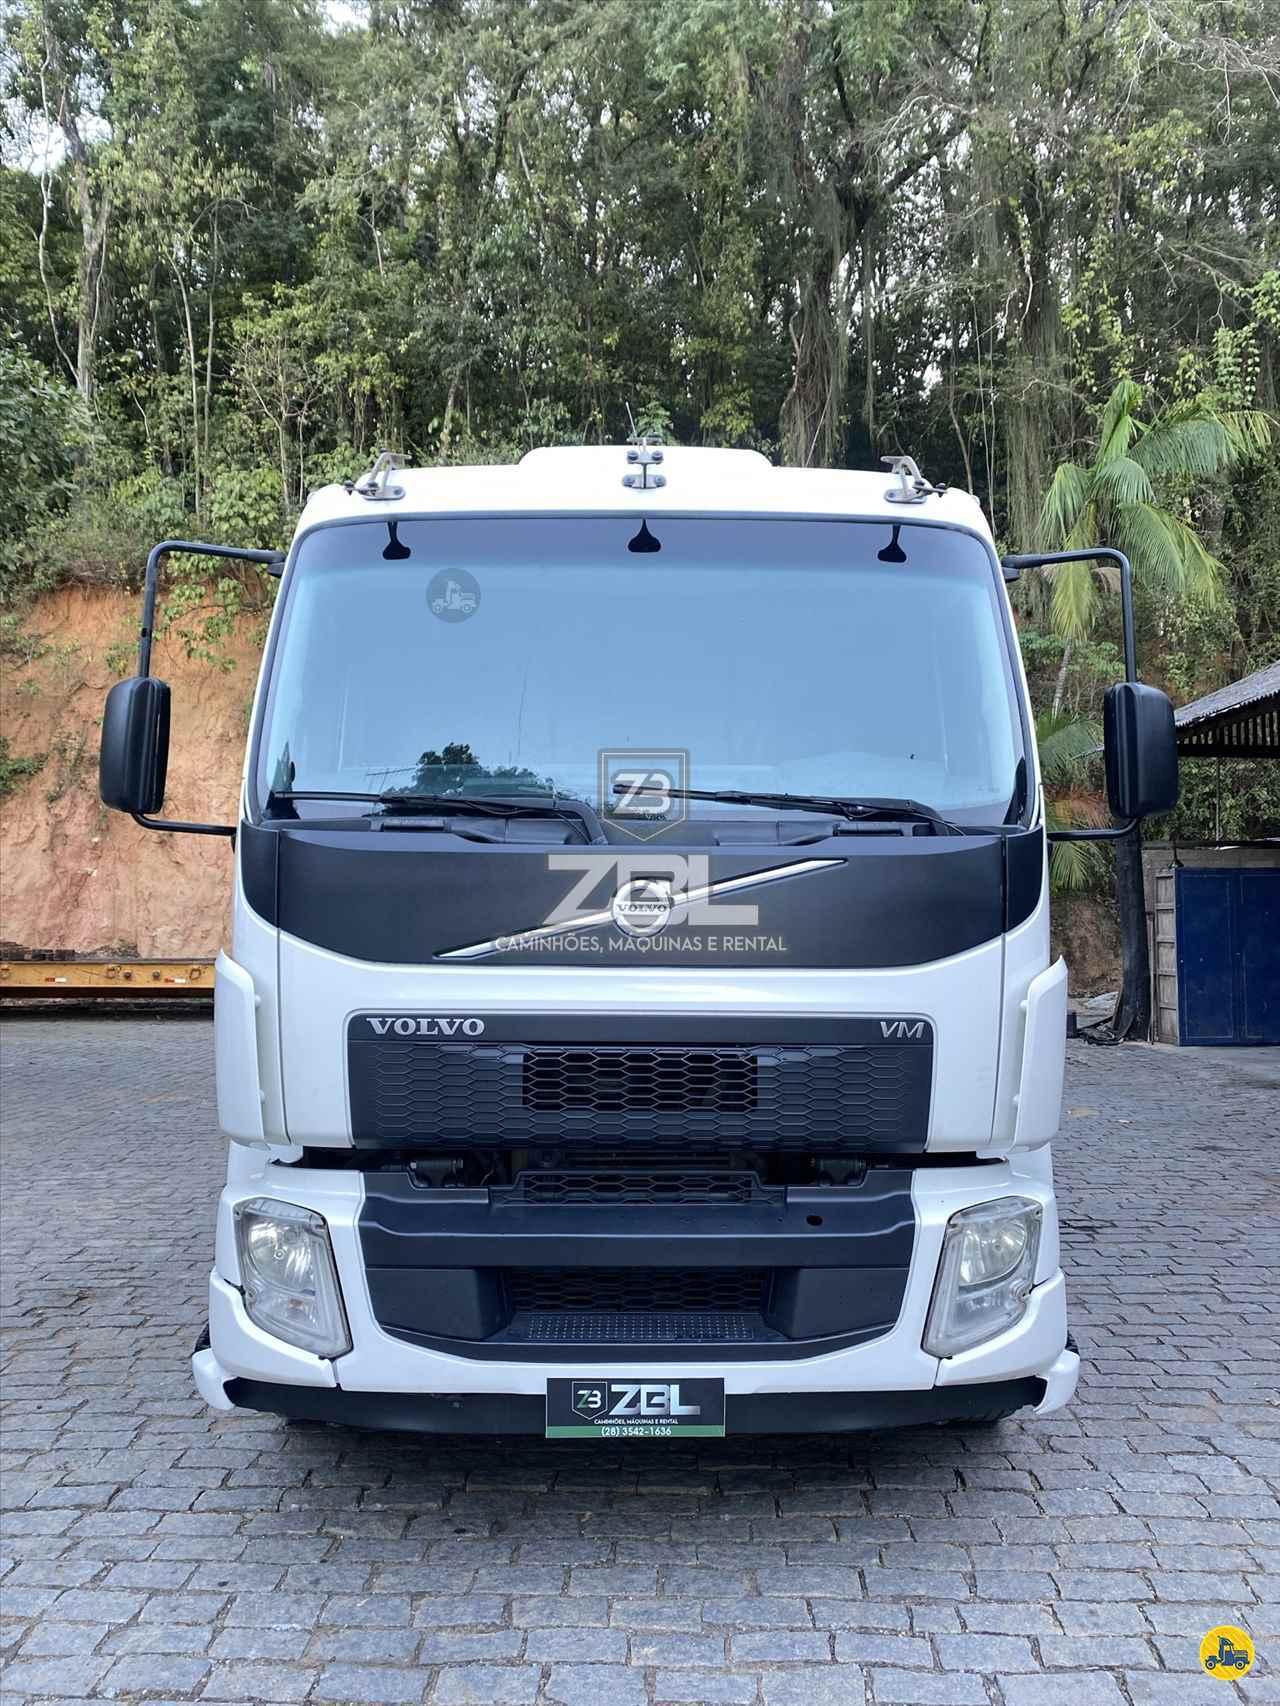 CAMINHAO VOLVO VOLVO VM 270 Carga Seca BiTruck 8x2 ZBL Caminhões CASTELO ESPÍRITO SANTO ES